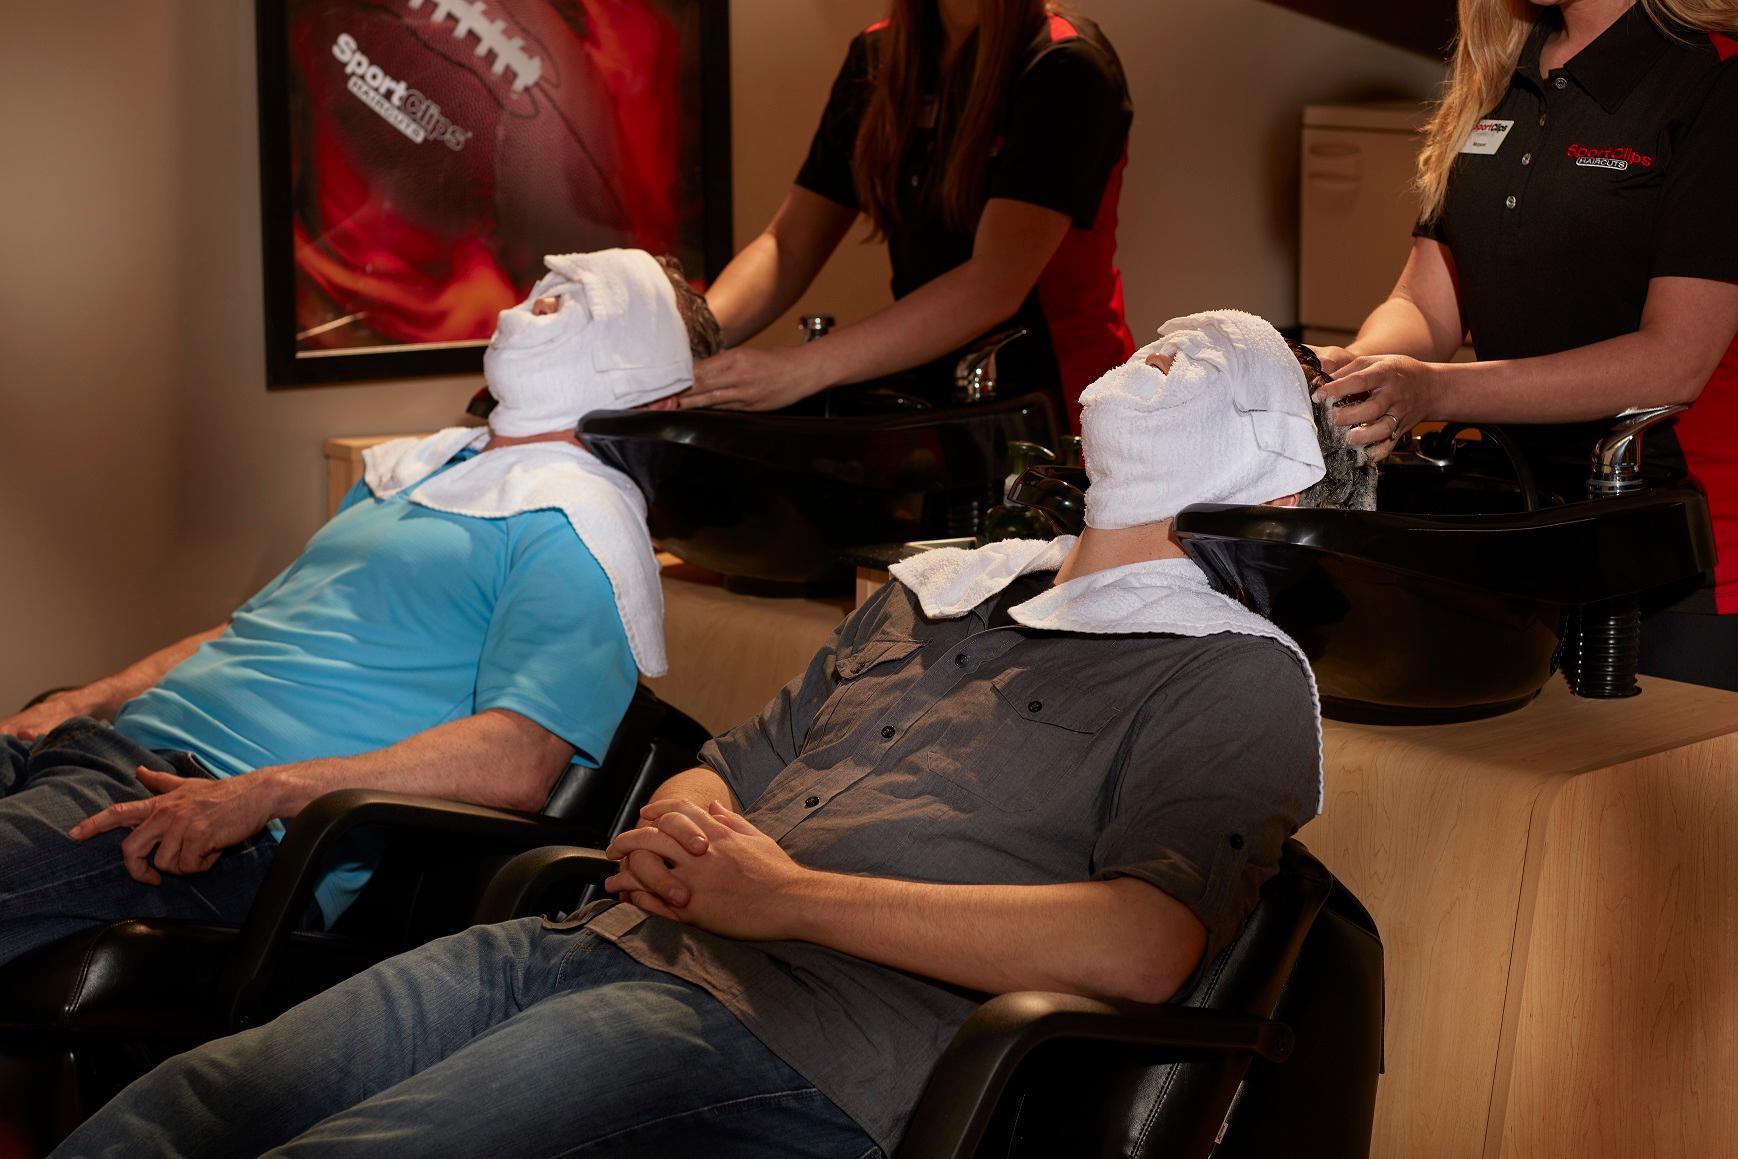 Sport Clips Haircuts of Carlsbad image 1